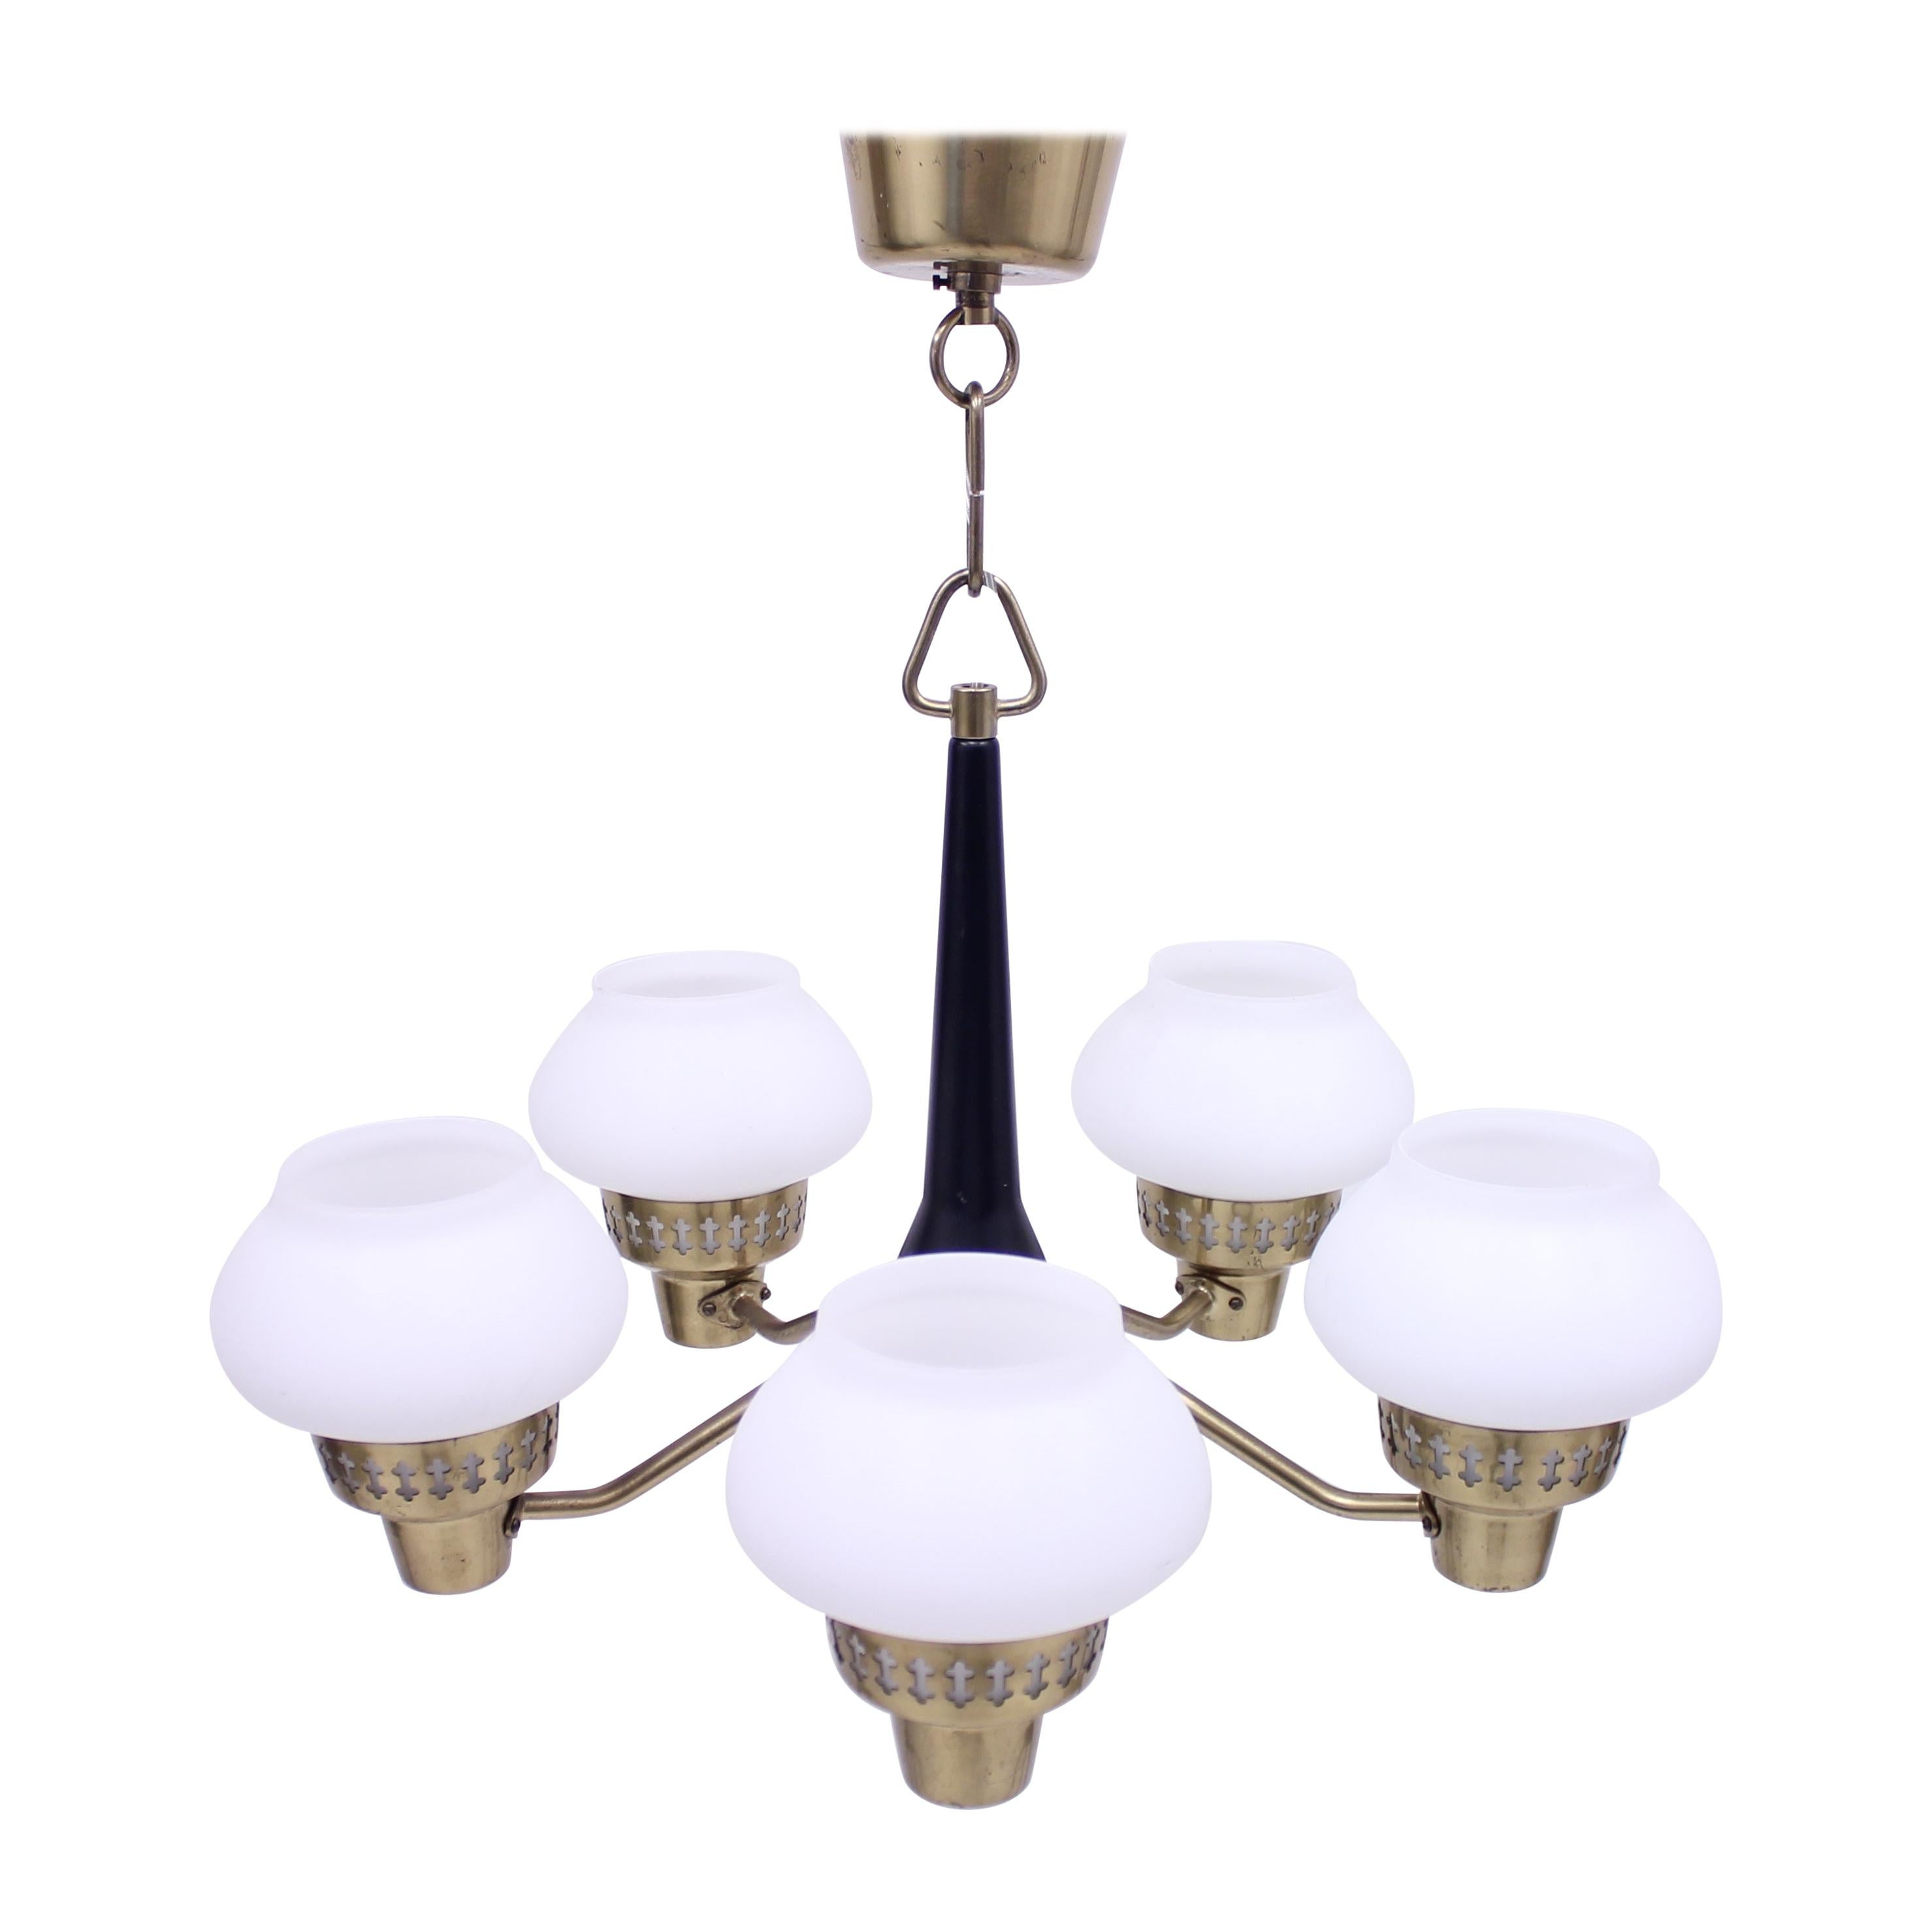 ASEA Five-Light Ceiling Lamp, 1950s